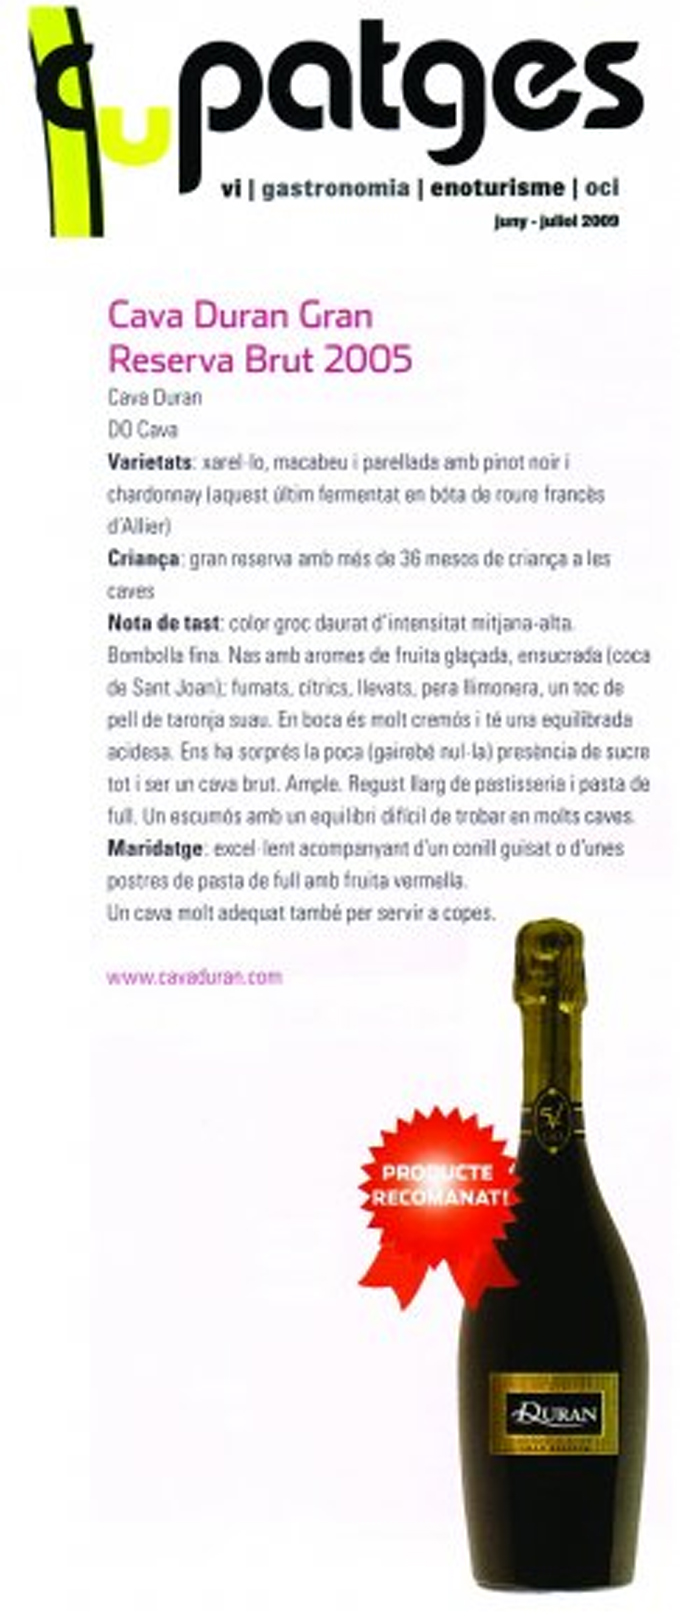 cupatges-magazine-duran-5v-gran-reserva-june-2009